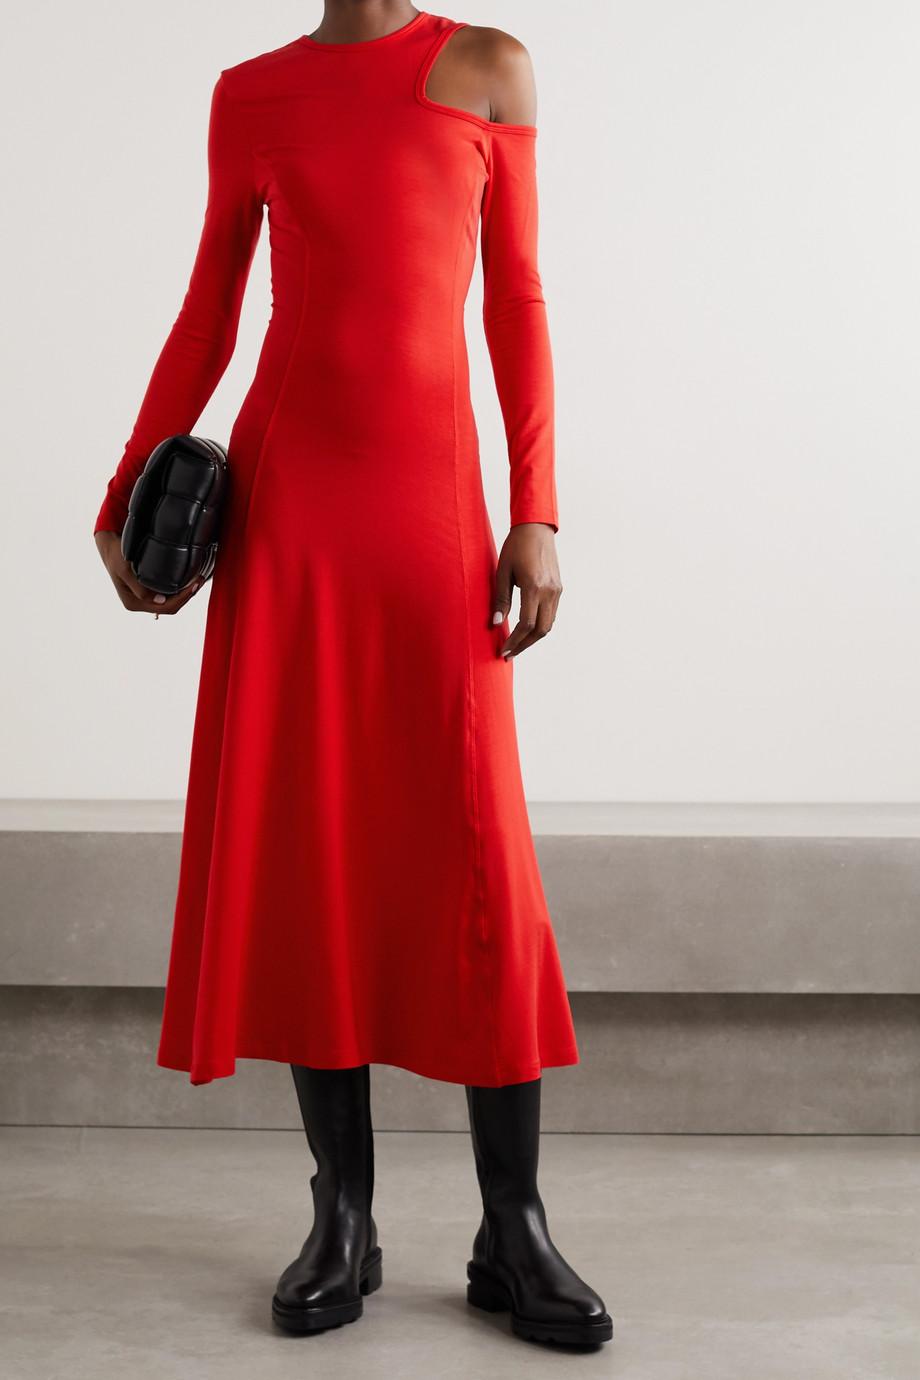 Ninety Percent 挖剪弹力天丝平纹布中长连衣裙